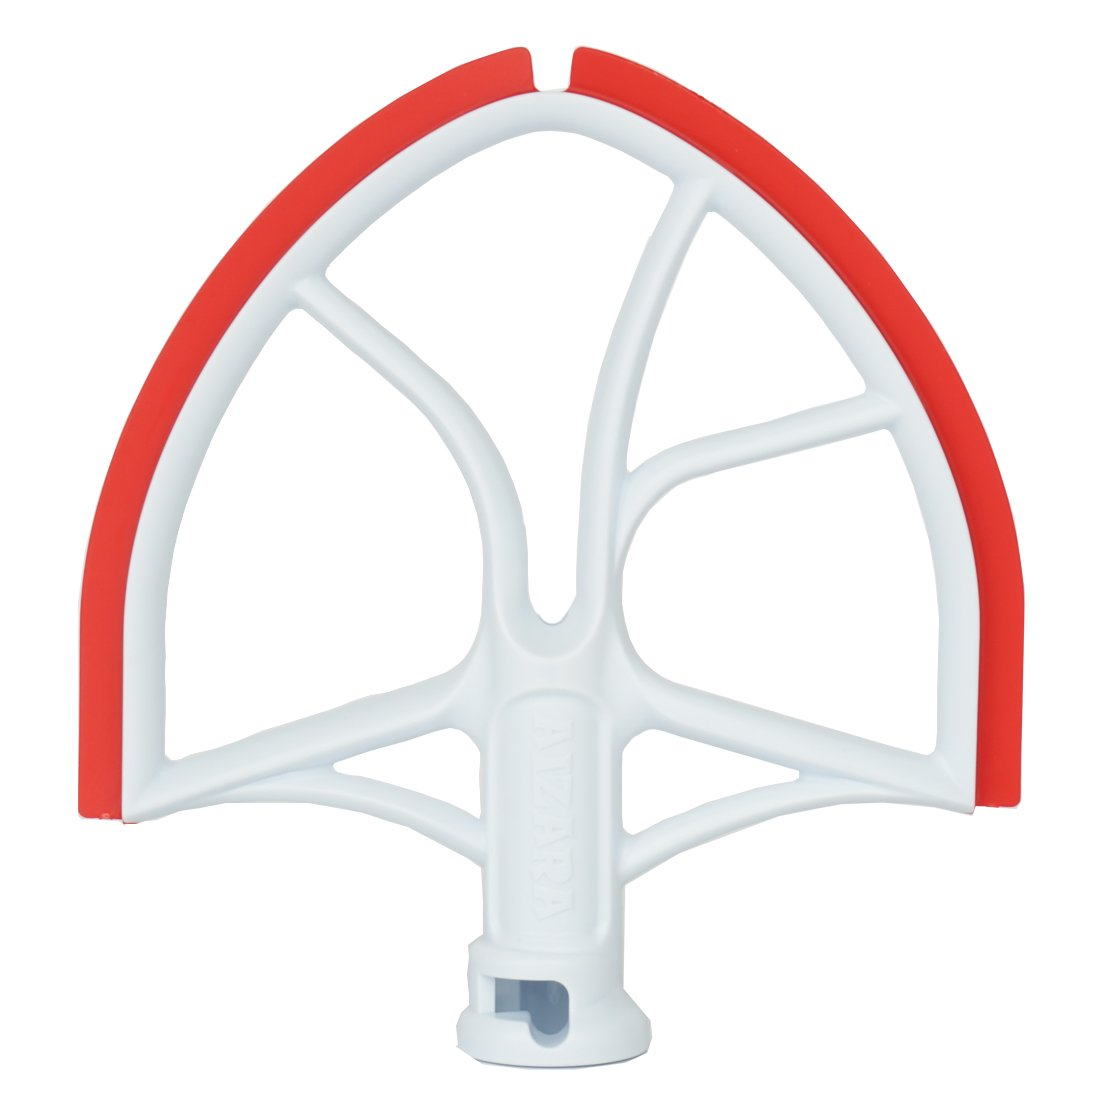 Flat Beater Blade,Attachments/Accessory for KitchenAid 6-Quart Bowl Lift Mixer, Flex Edge Beater with Flex Edge Bowl Scraper